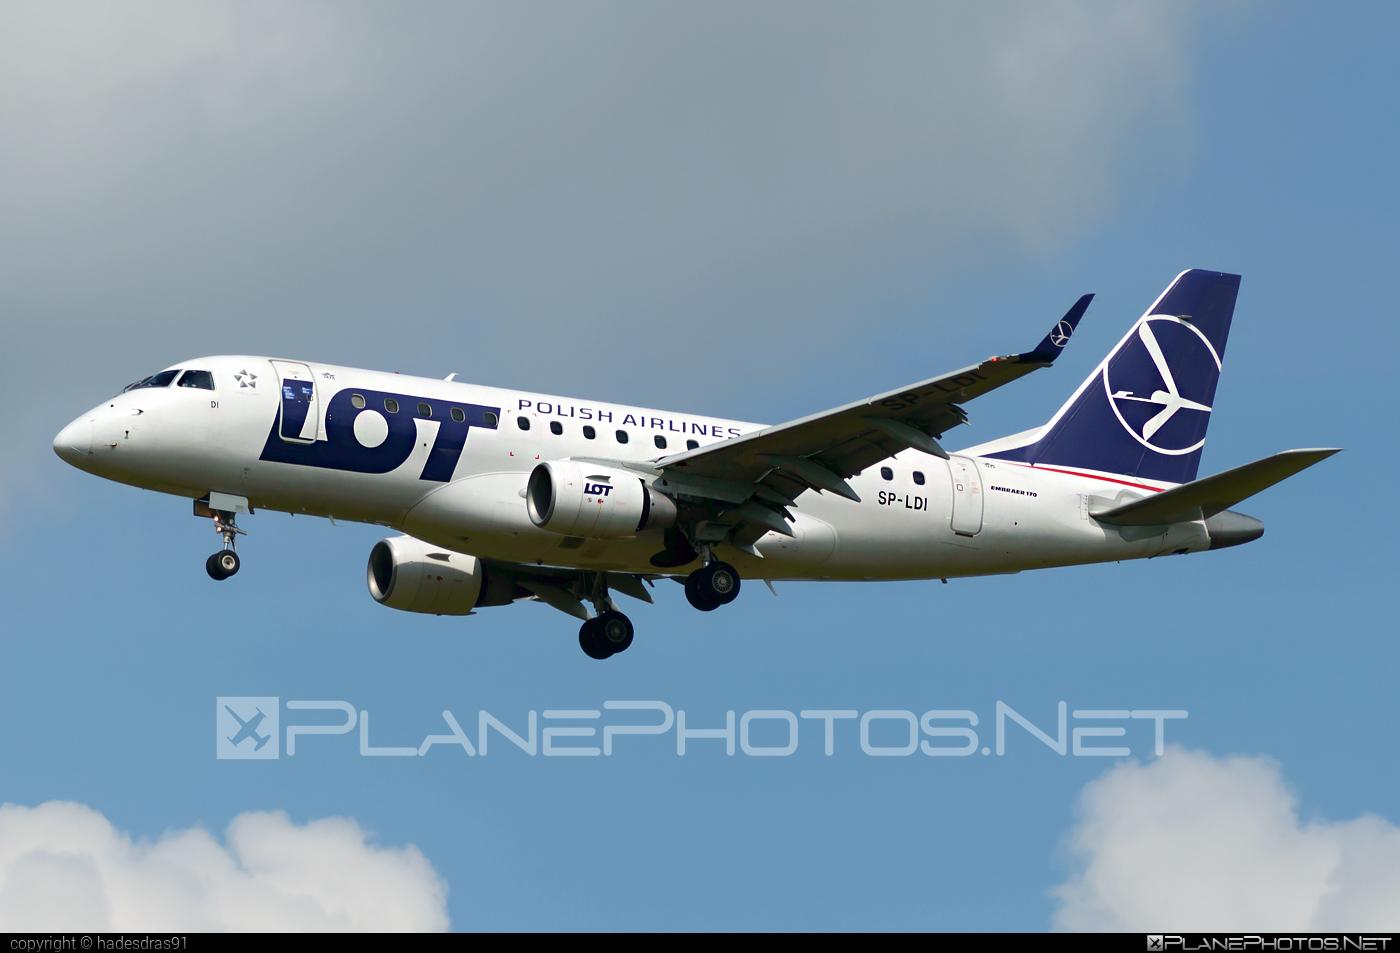 Embraer E170STD (ERJ-170-100STD) - SP-LDI operated by LOT Polish Airlines #e170 #embraer #embraer170 #embraer170std #erj170 #erj170100 #erj170100std #erj170std #lot #lotpolishairlines